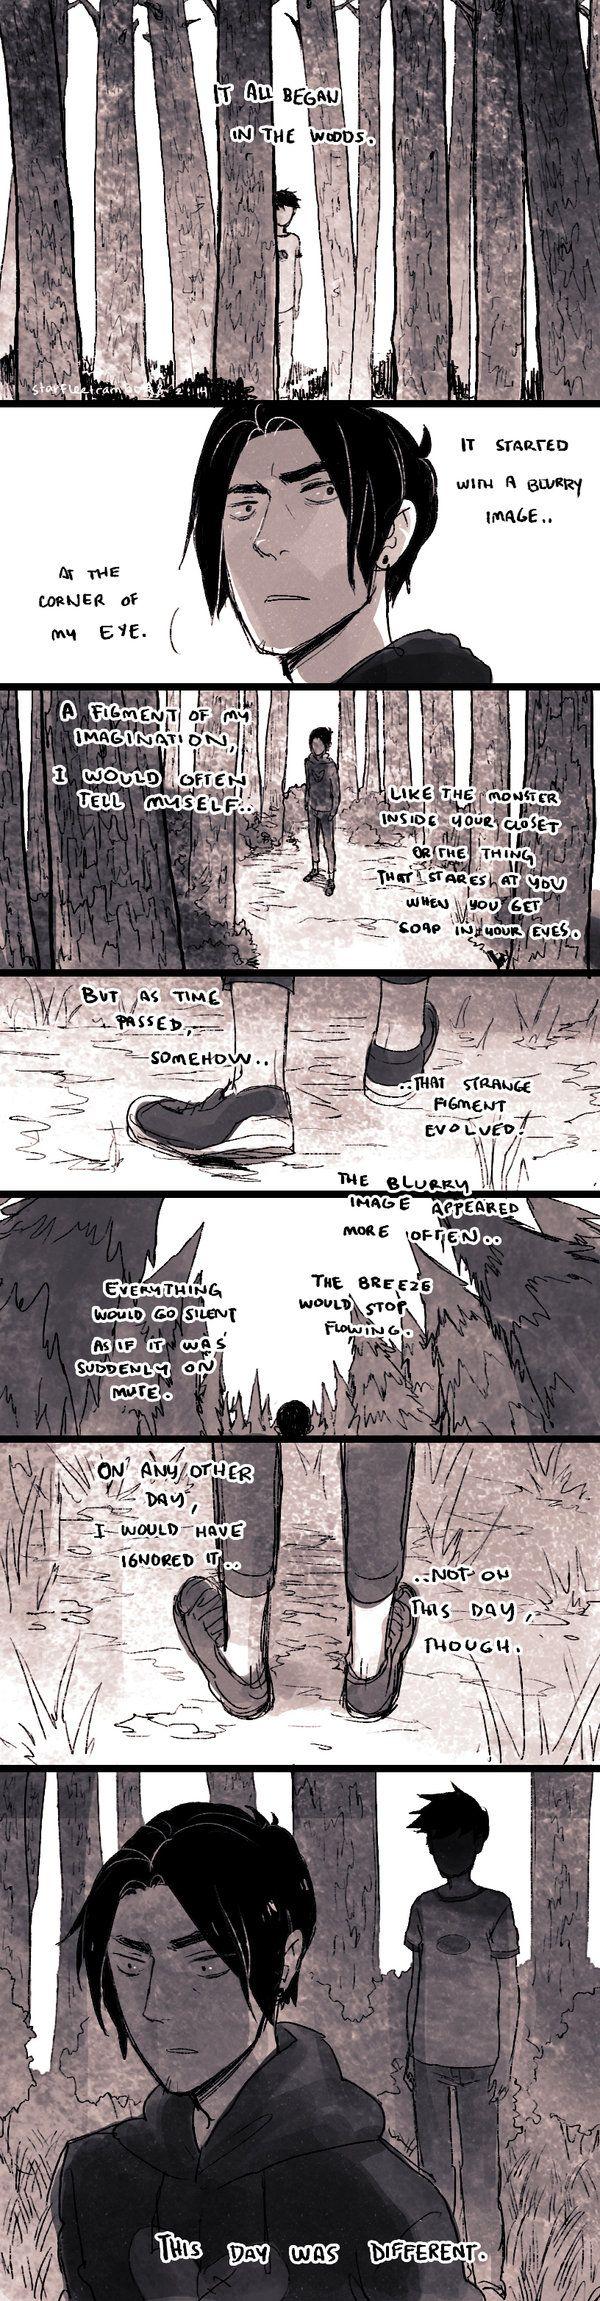 Day 1.0: The Boy in the Woods by demitasse-lover.deviantart.com on @DeviantArt